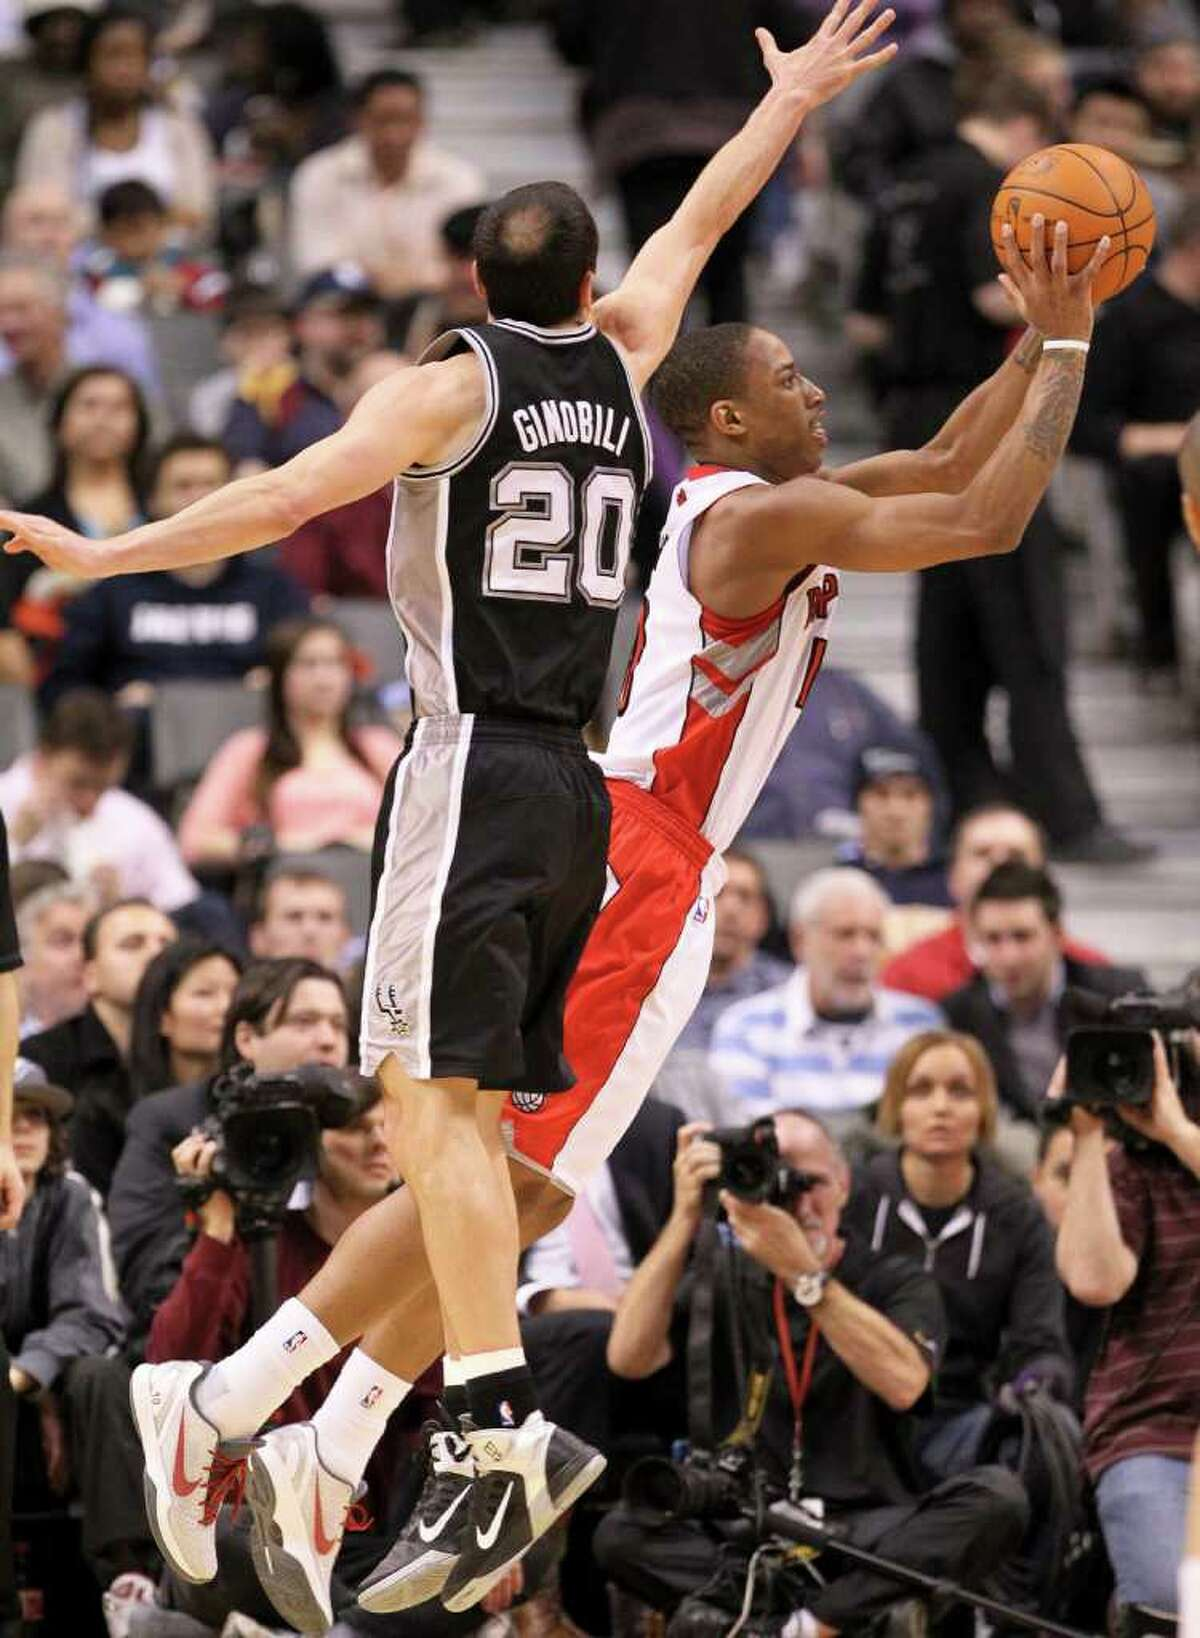 Toronto Raptors guard DeMar DeRozan, right, shoots past San Antonio Spurs guard Manu Ginobili during the first half of an NBA basketball game in Toronto on Wednesday, Feb. 9, 2011.